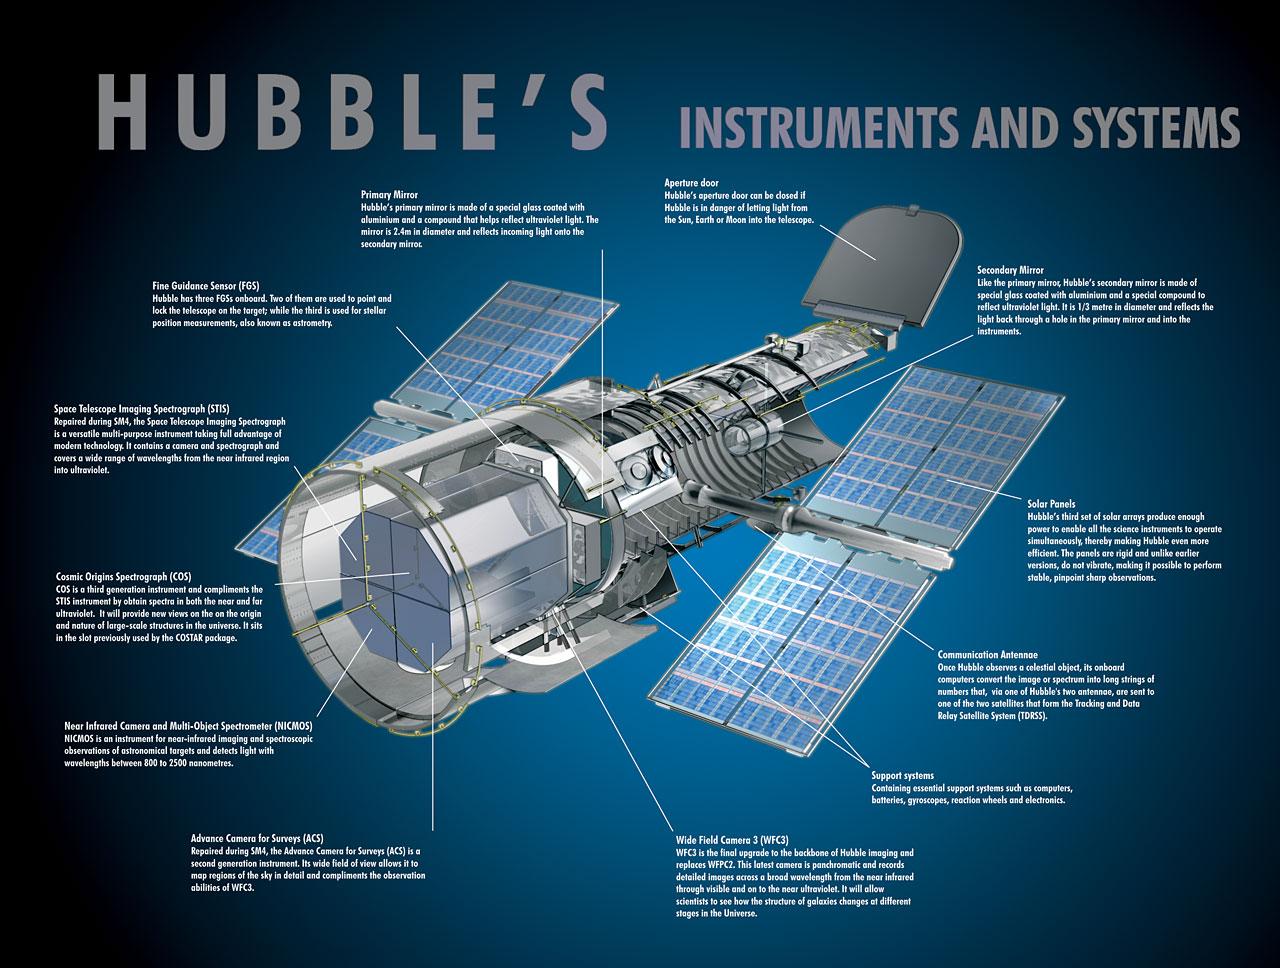 hubble space telescope instruments - photo #14